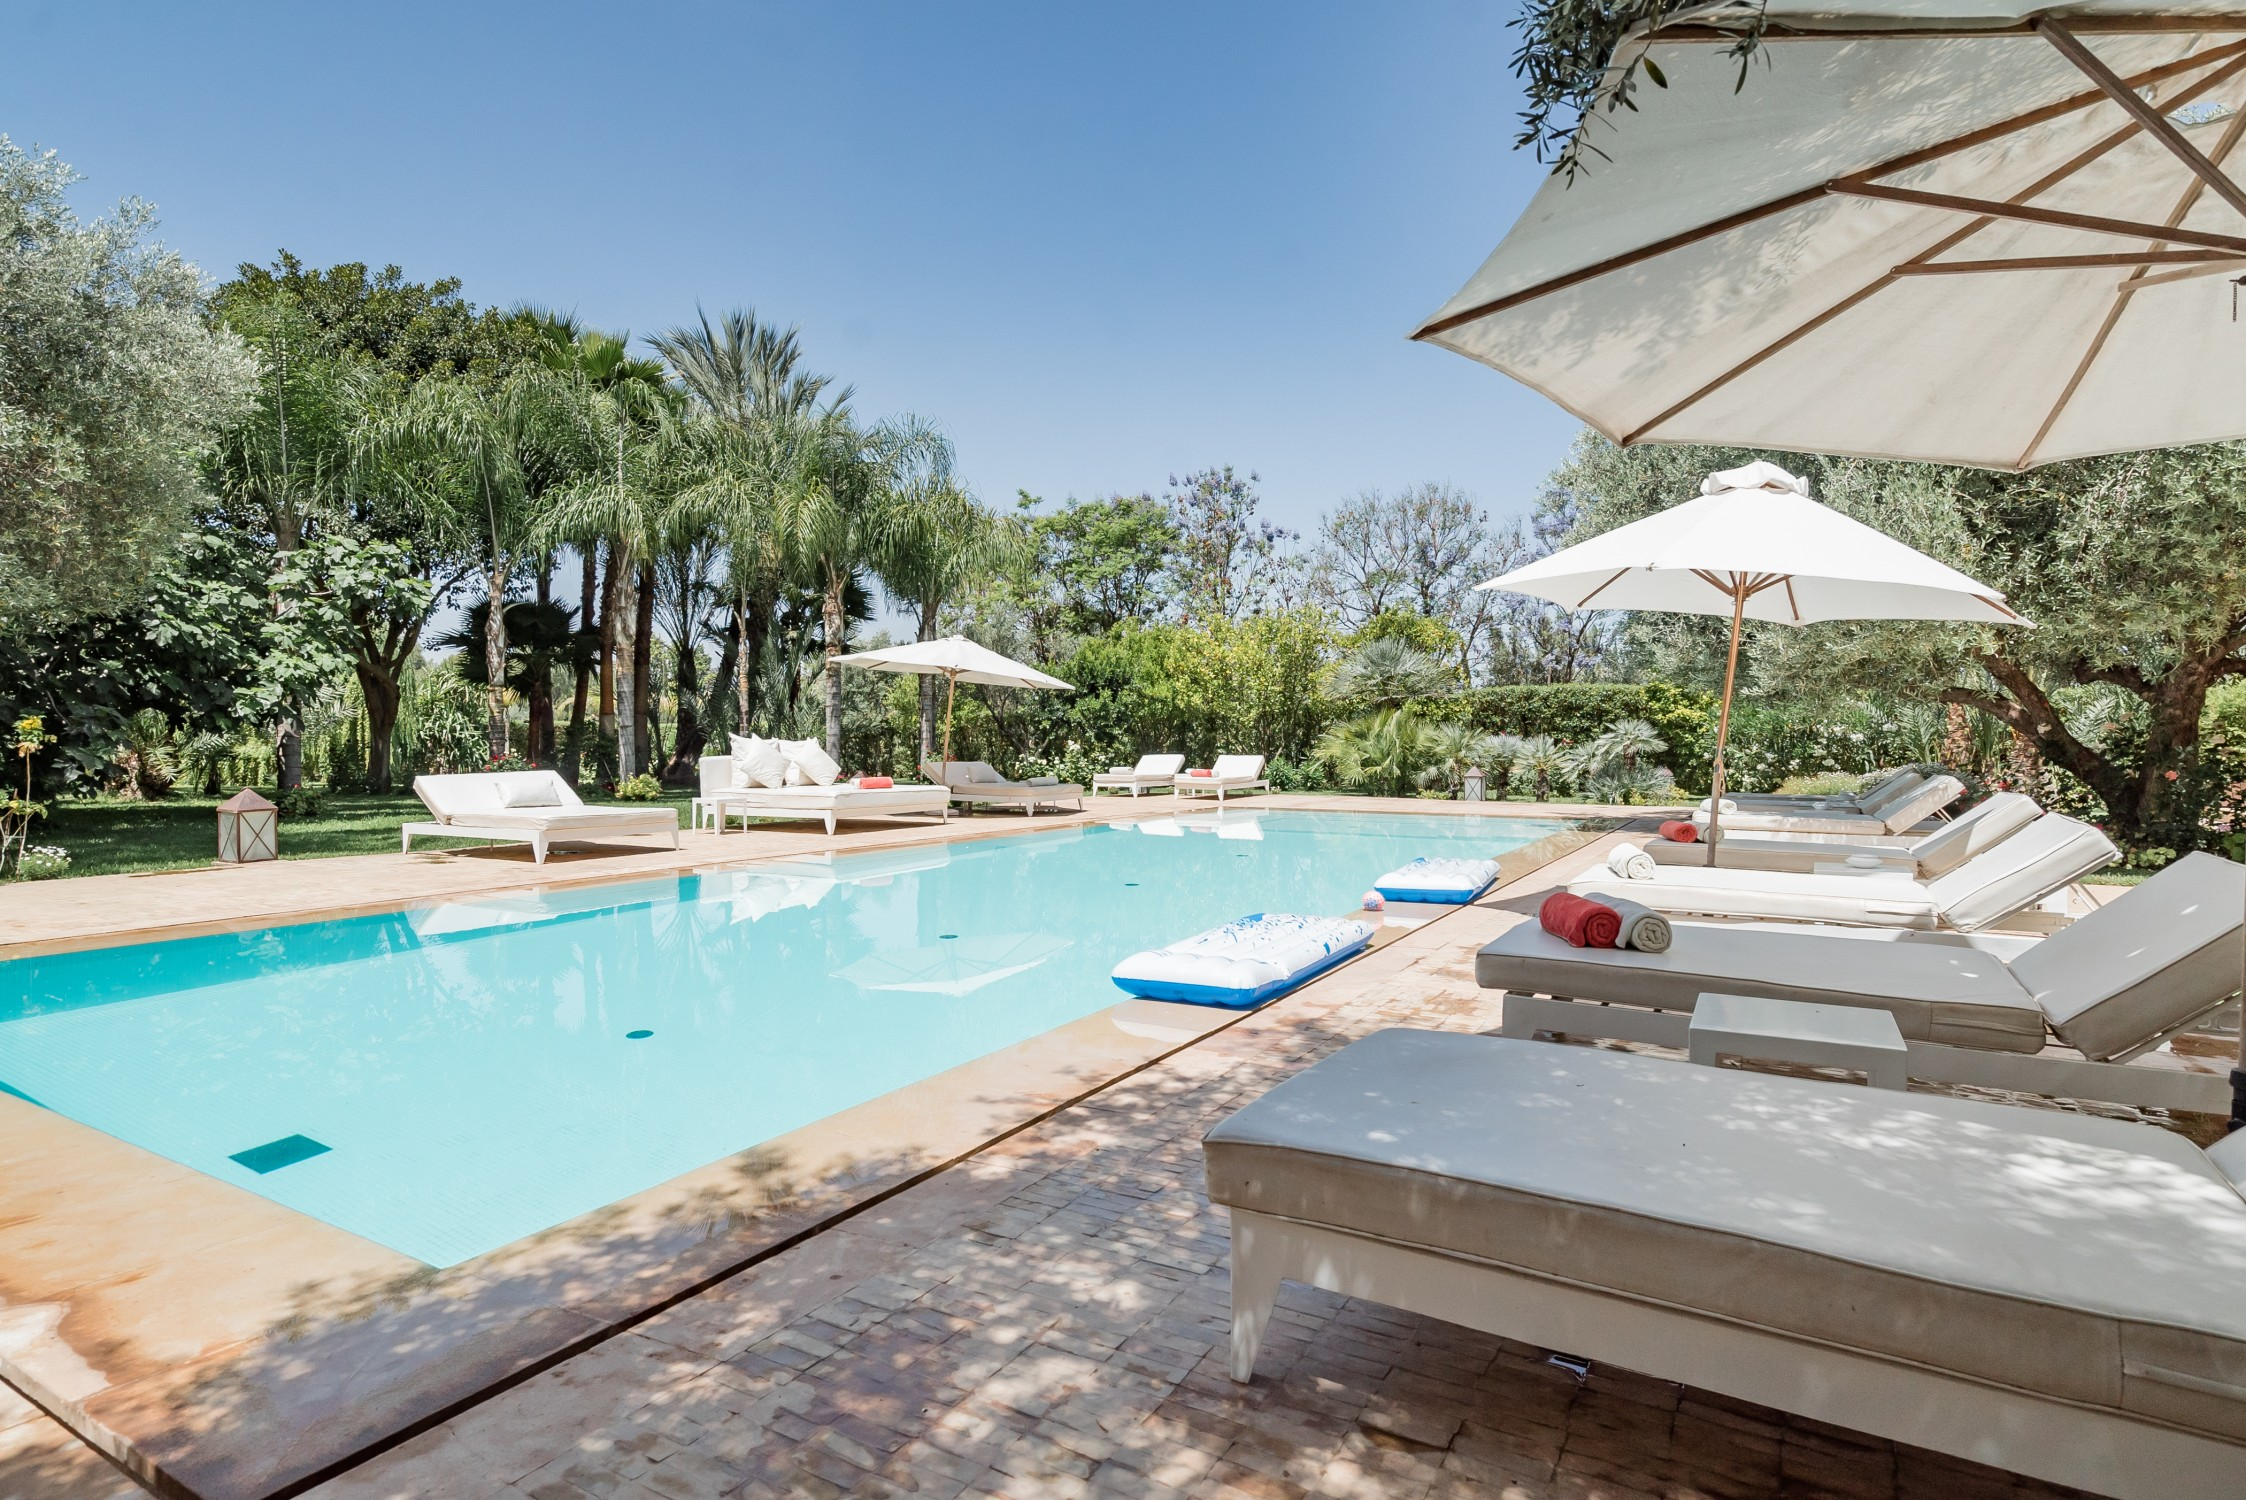 Morocco Luxury Airbnb Pool